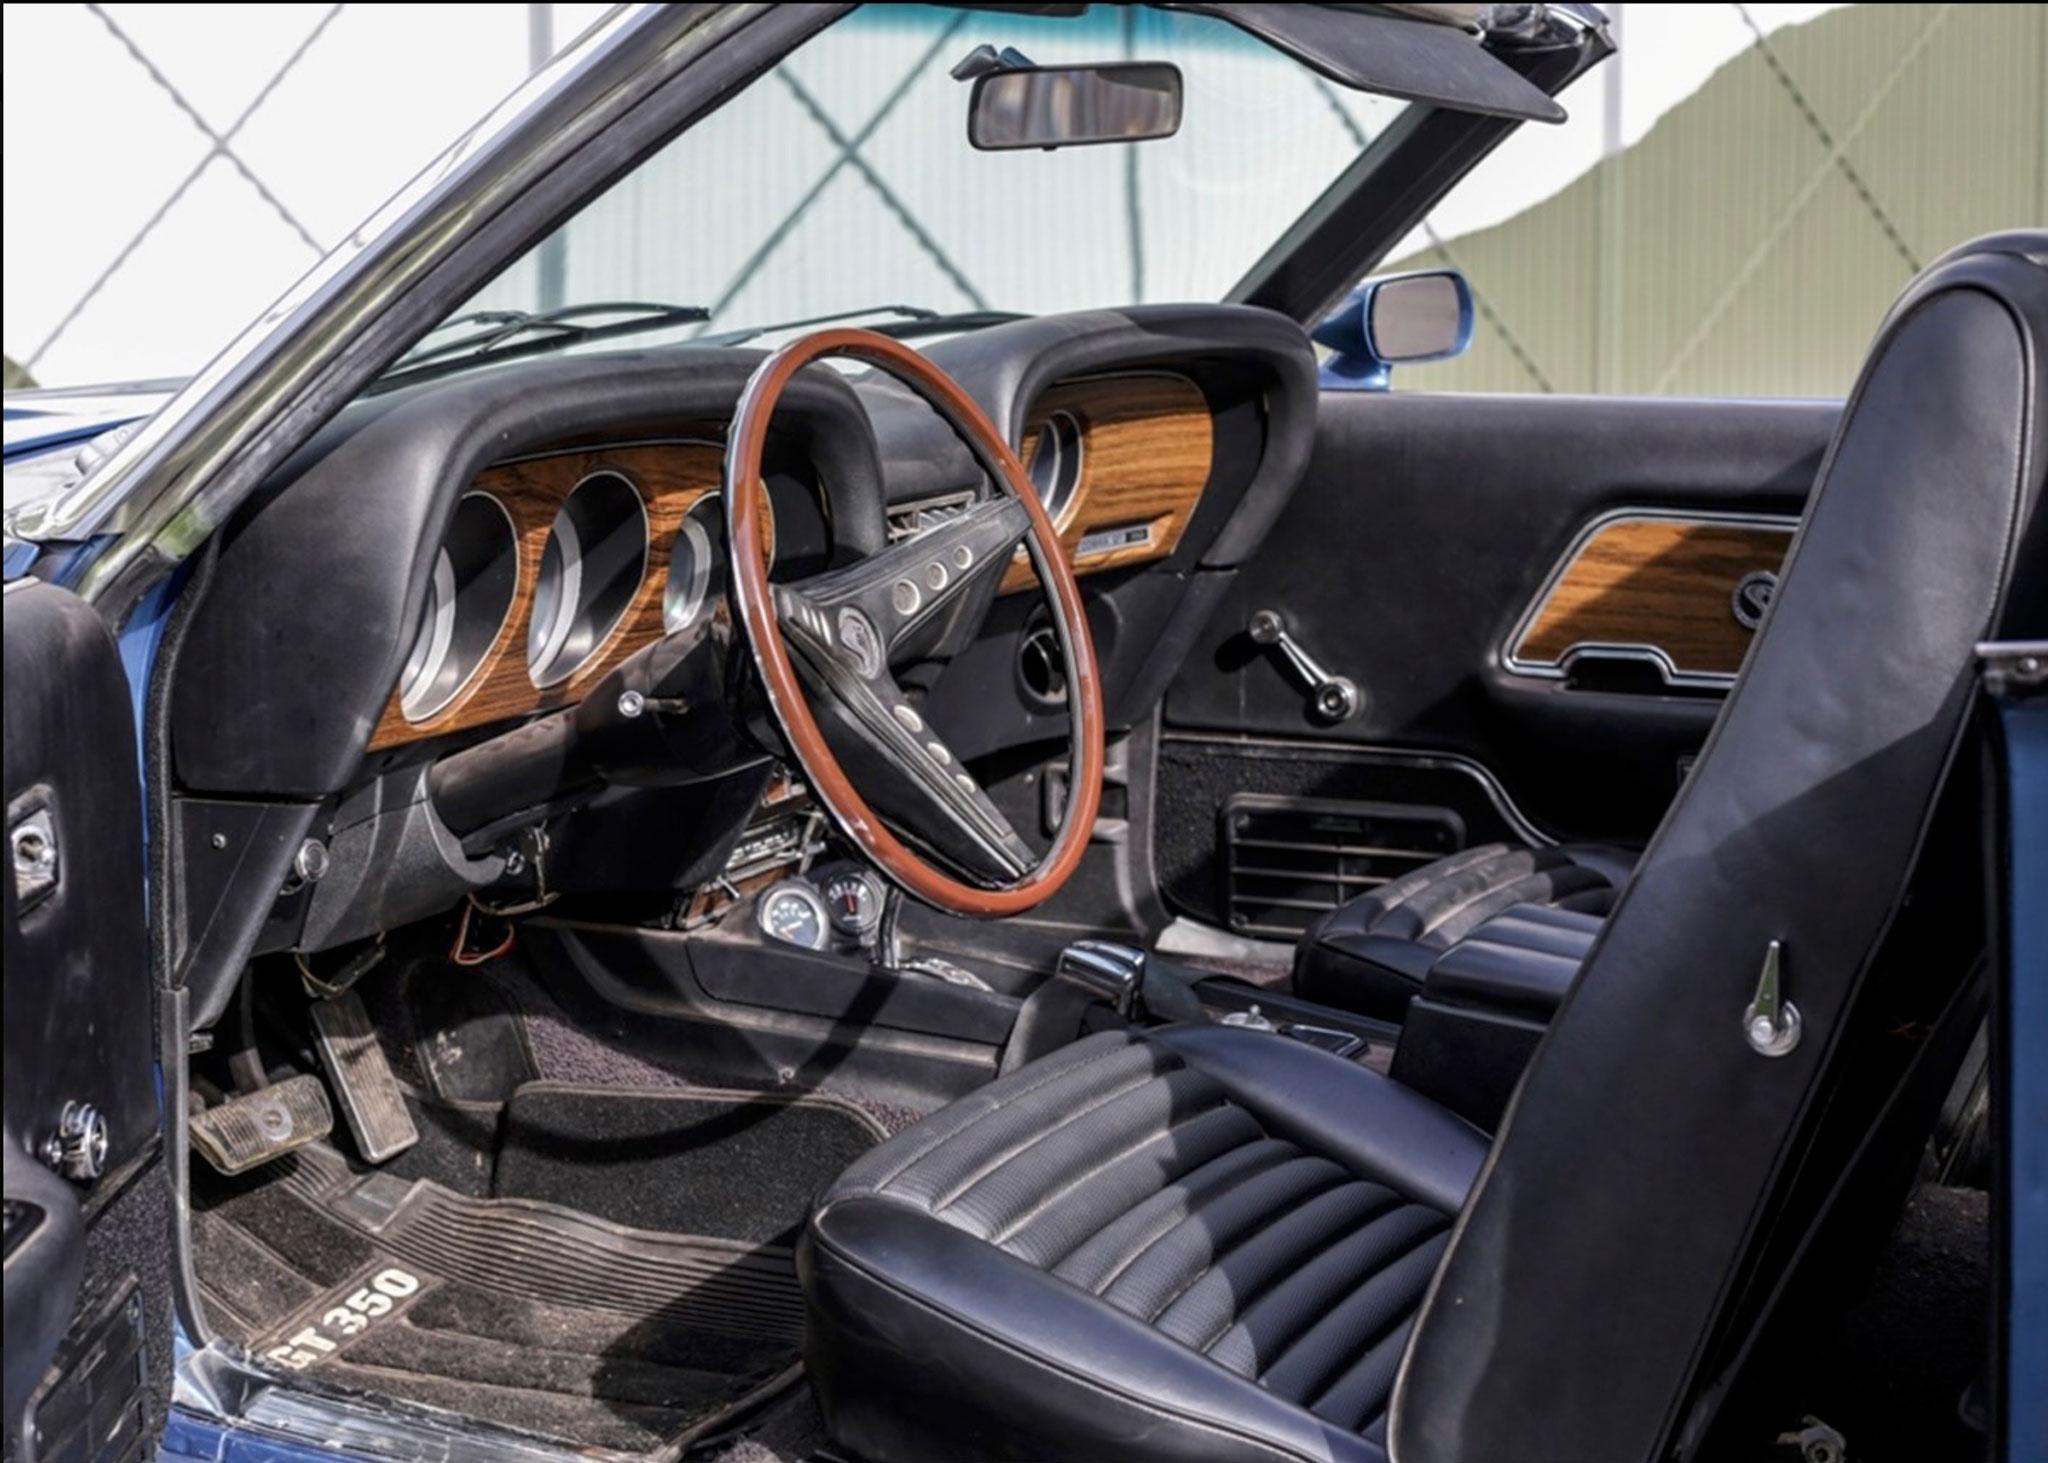 1969 Shelby GT350 Convertible sur base de Mustang Mach 1 - Coups de Coeur Historics Auctioneers.